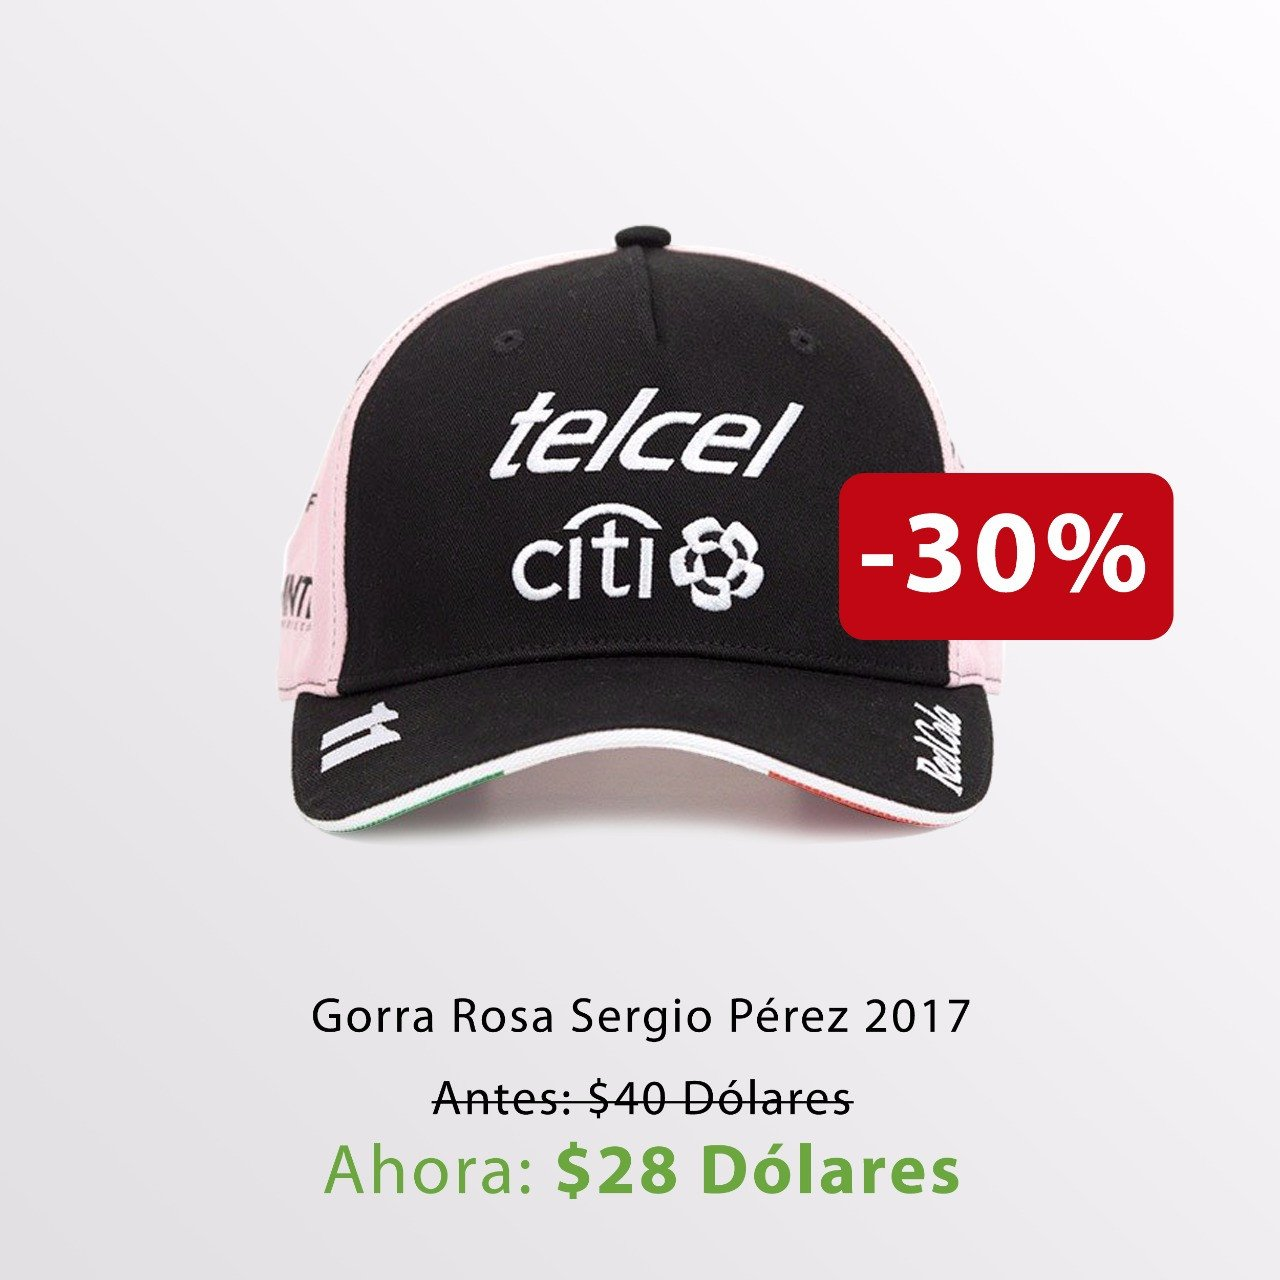 Gorra Checo Pérez Rosa 2017 / 2017 Checo Perez Pink Cap